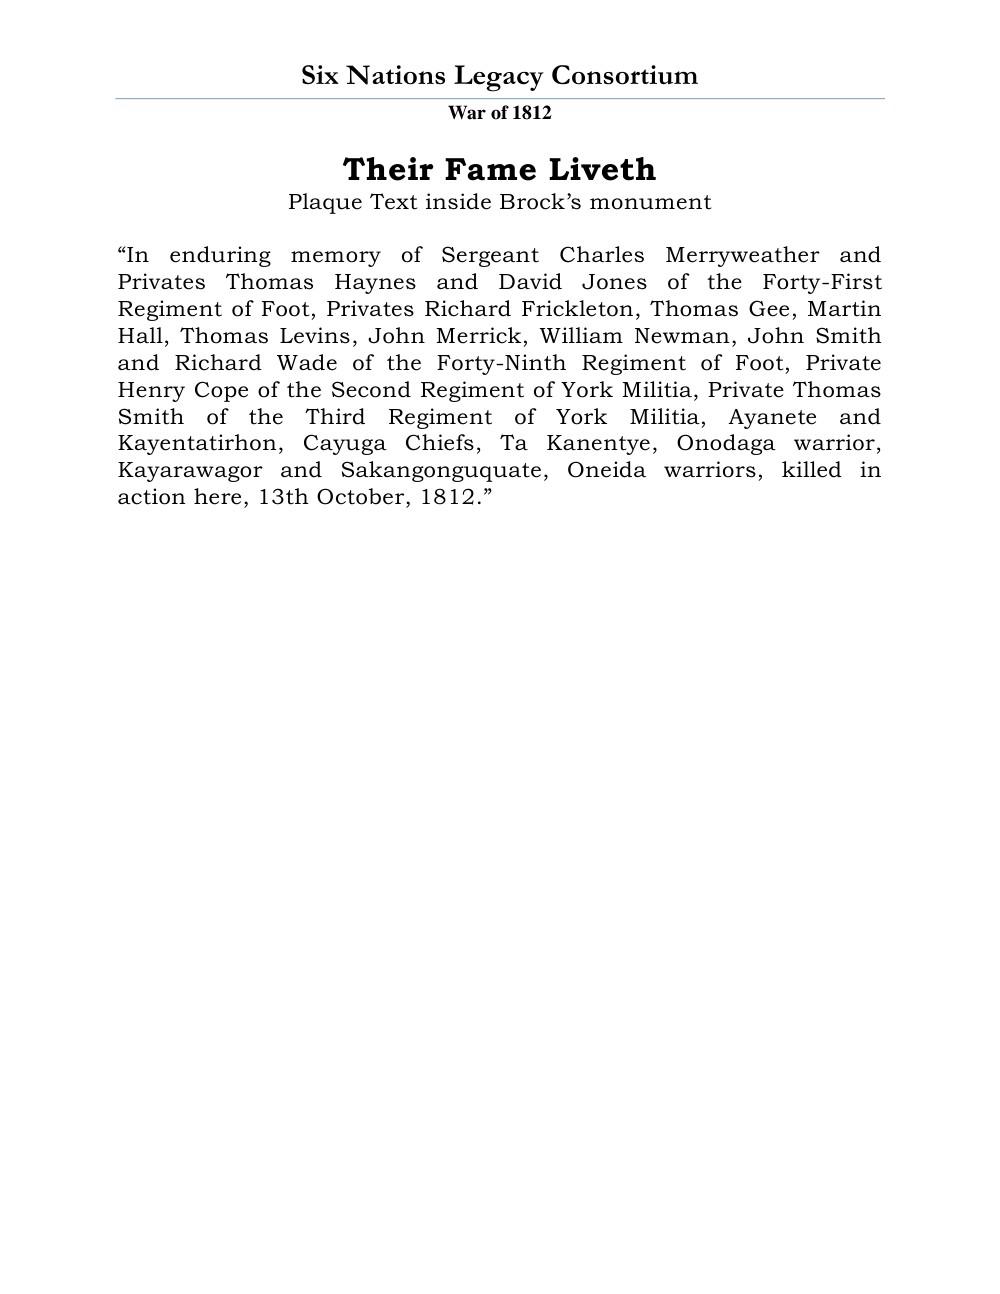 War of 1812 Series (47): Their Fame Liveth